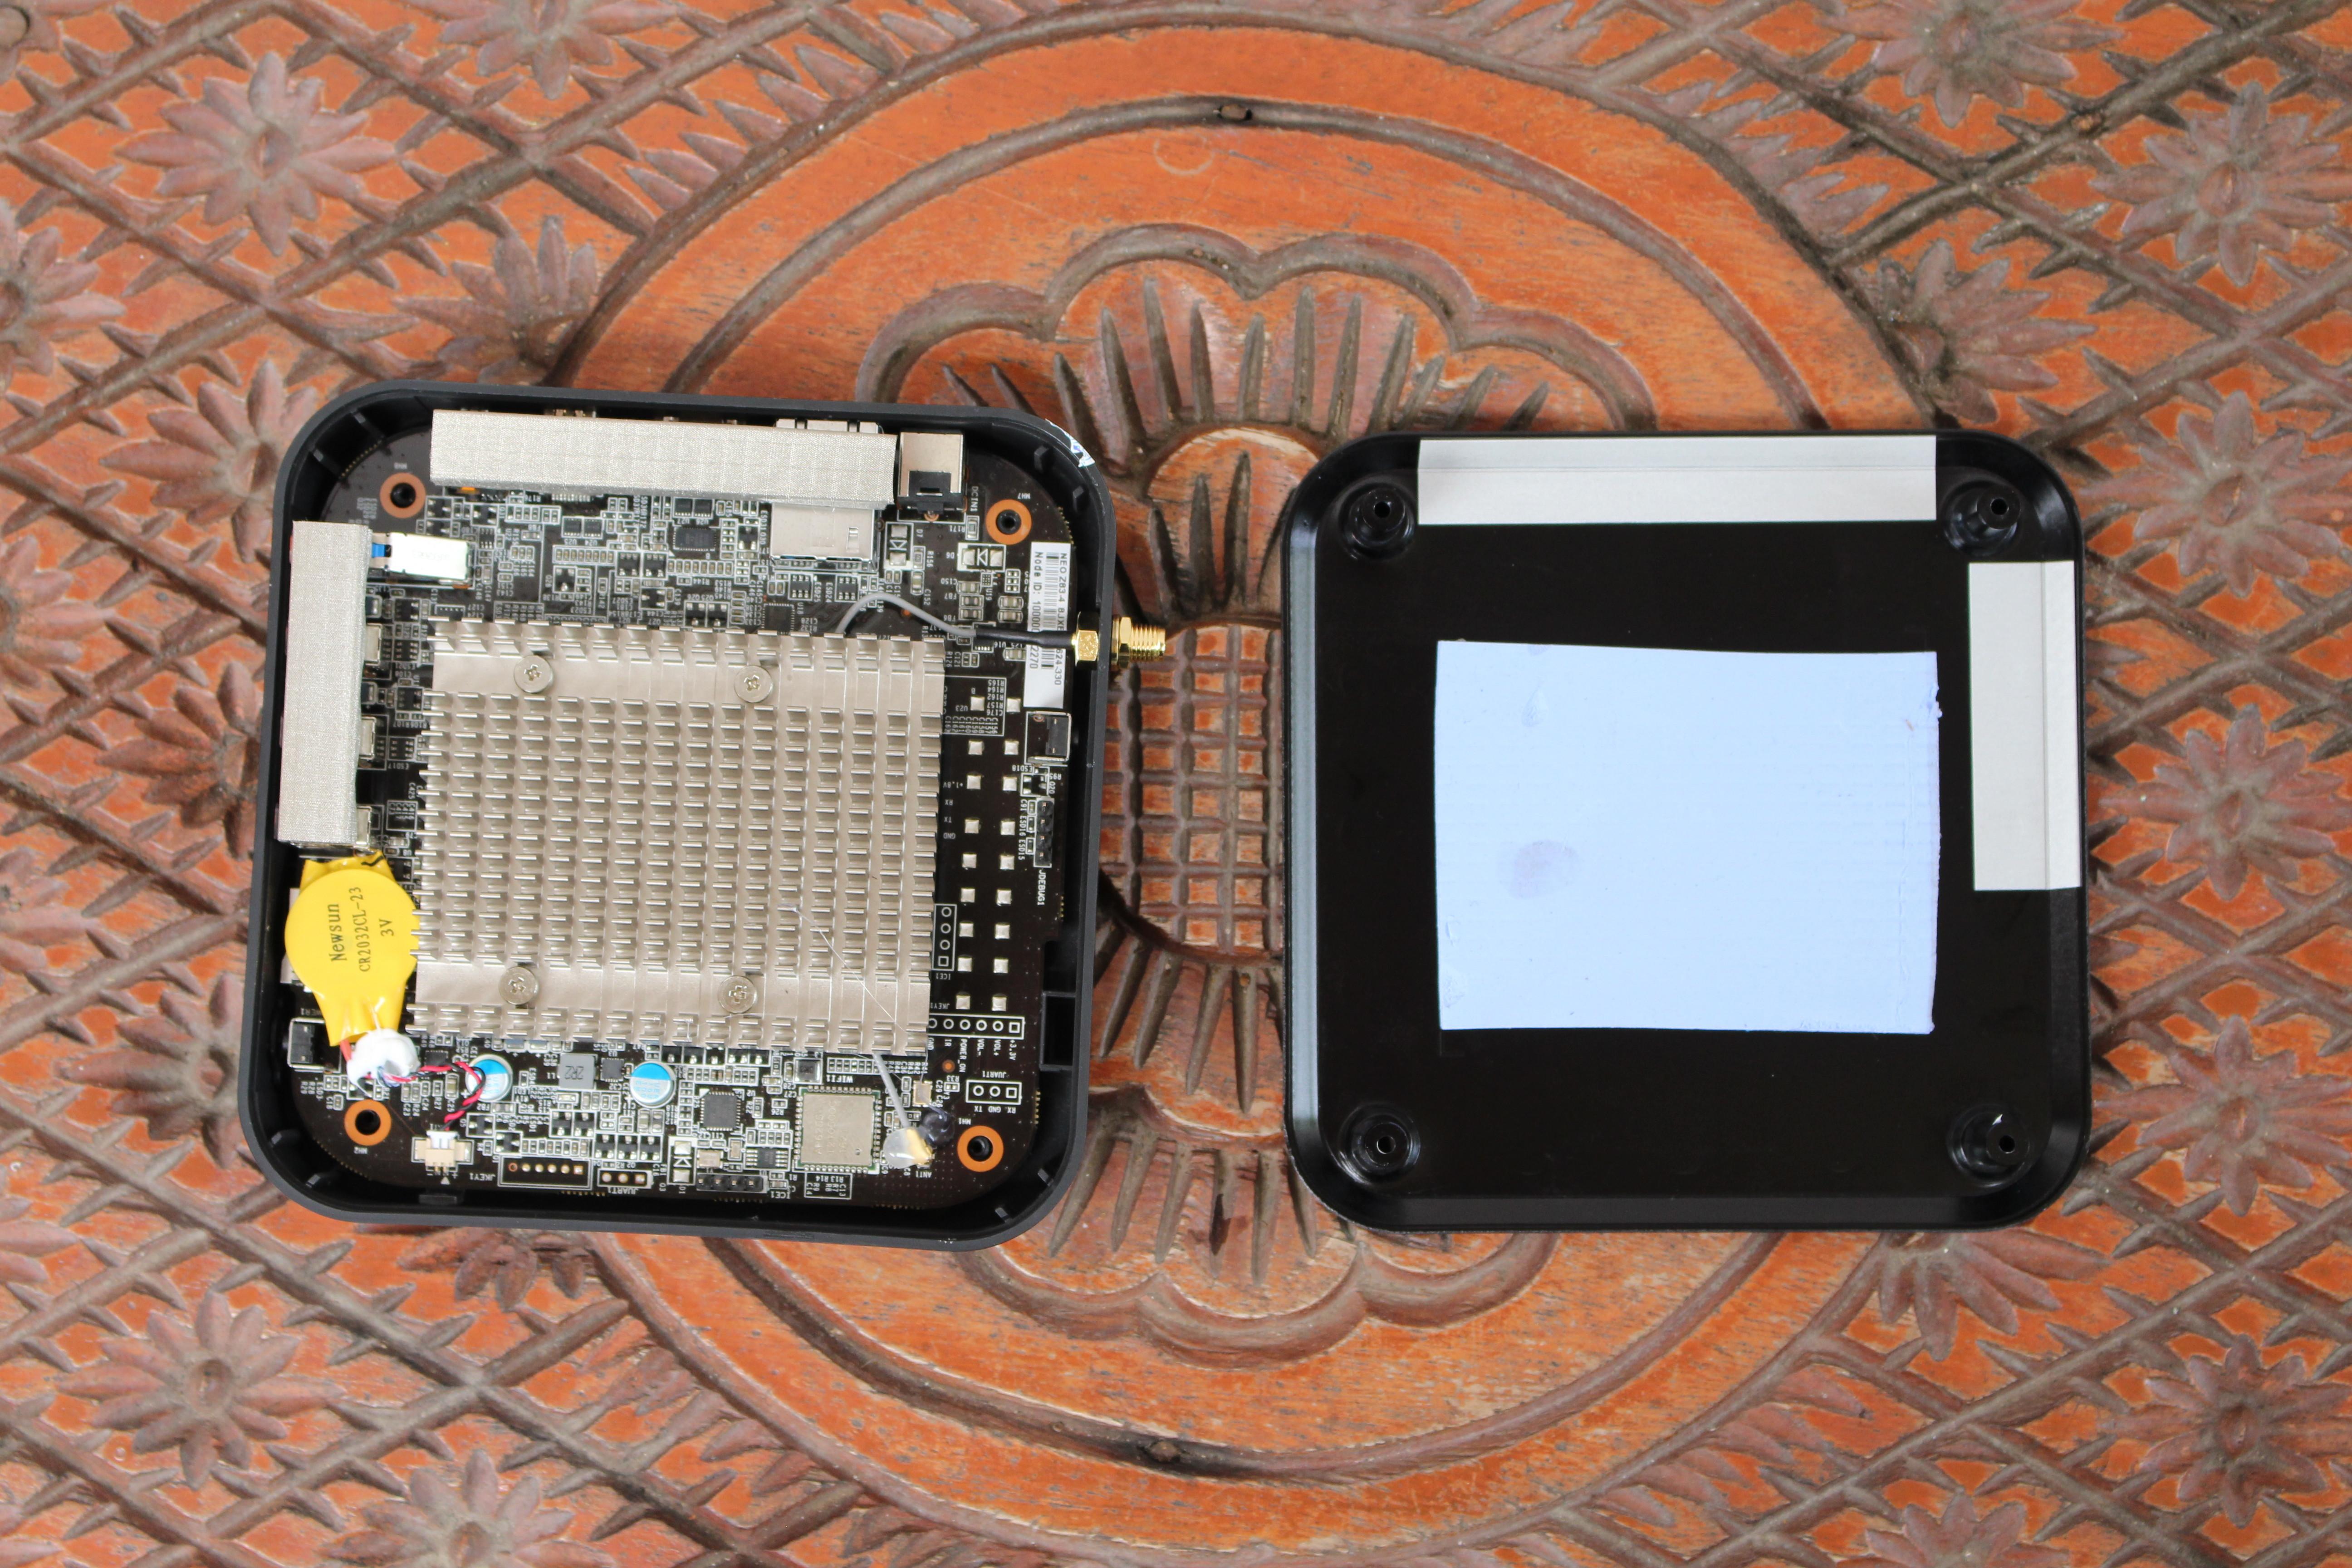 MINIX NEO Z83-4 Fanless mini PC Review - Part 1: Specs, Unboxing and